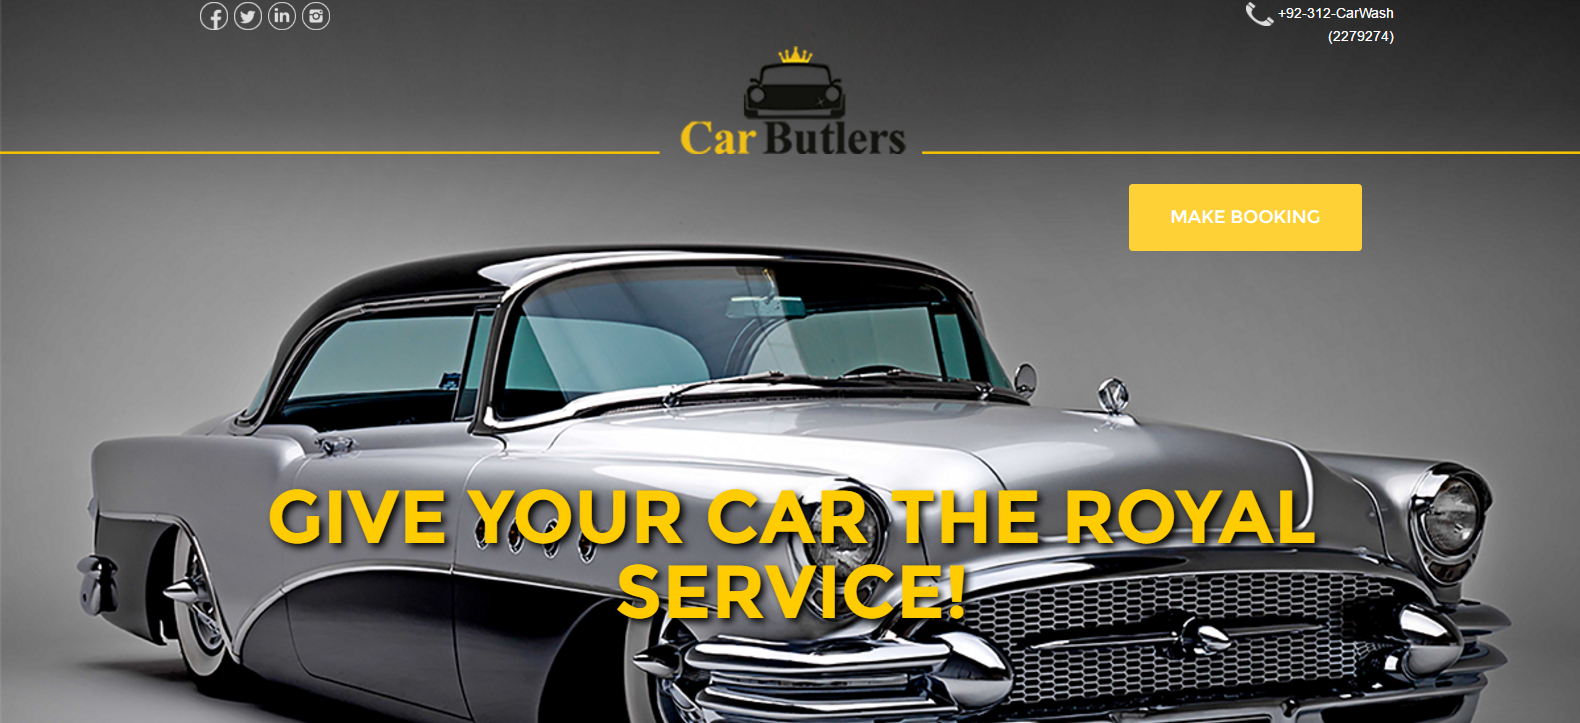 car-butlers-homepage-freshstartpk-onlinepr-startups-khawajamubasharmansoor